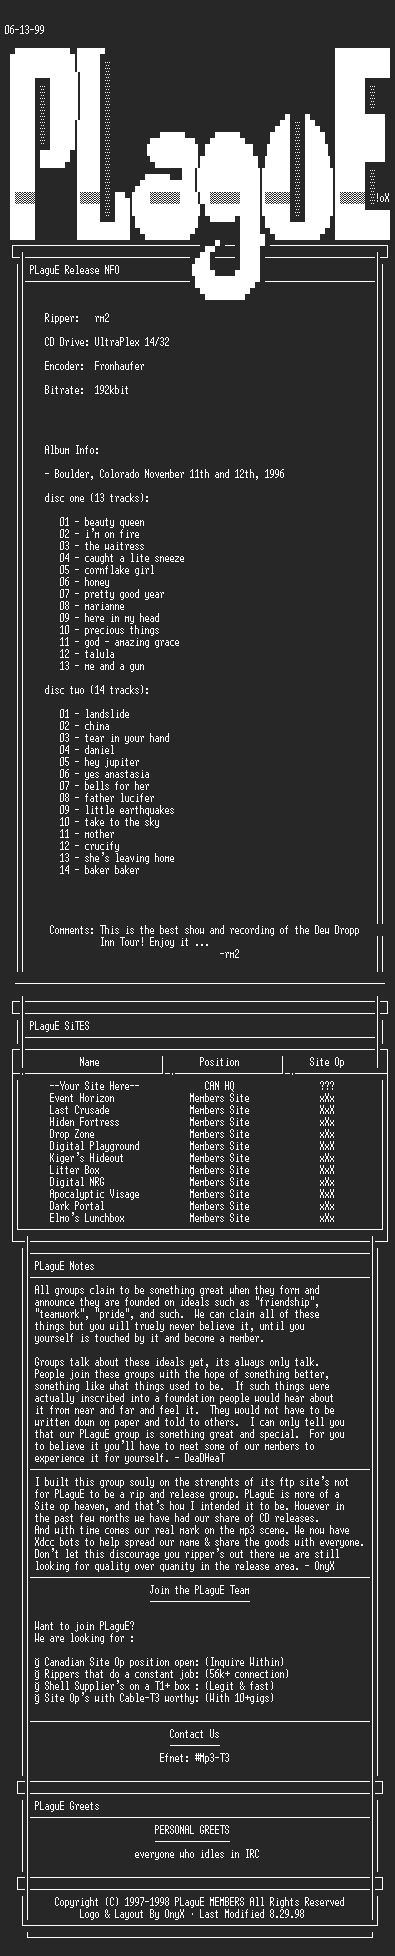 NFO file for Tori_Amos_-_DDI_Boulder-PLaguE